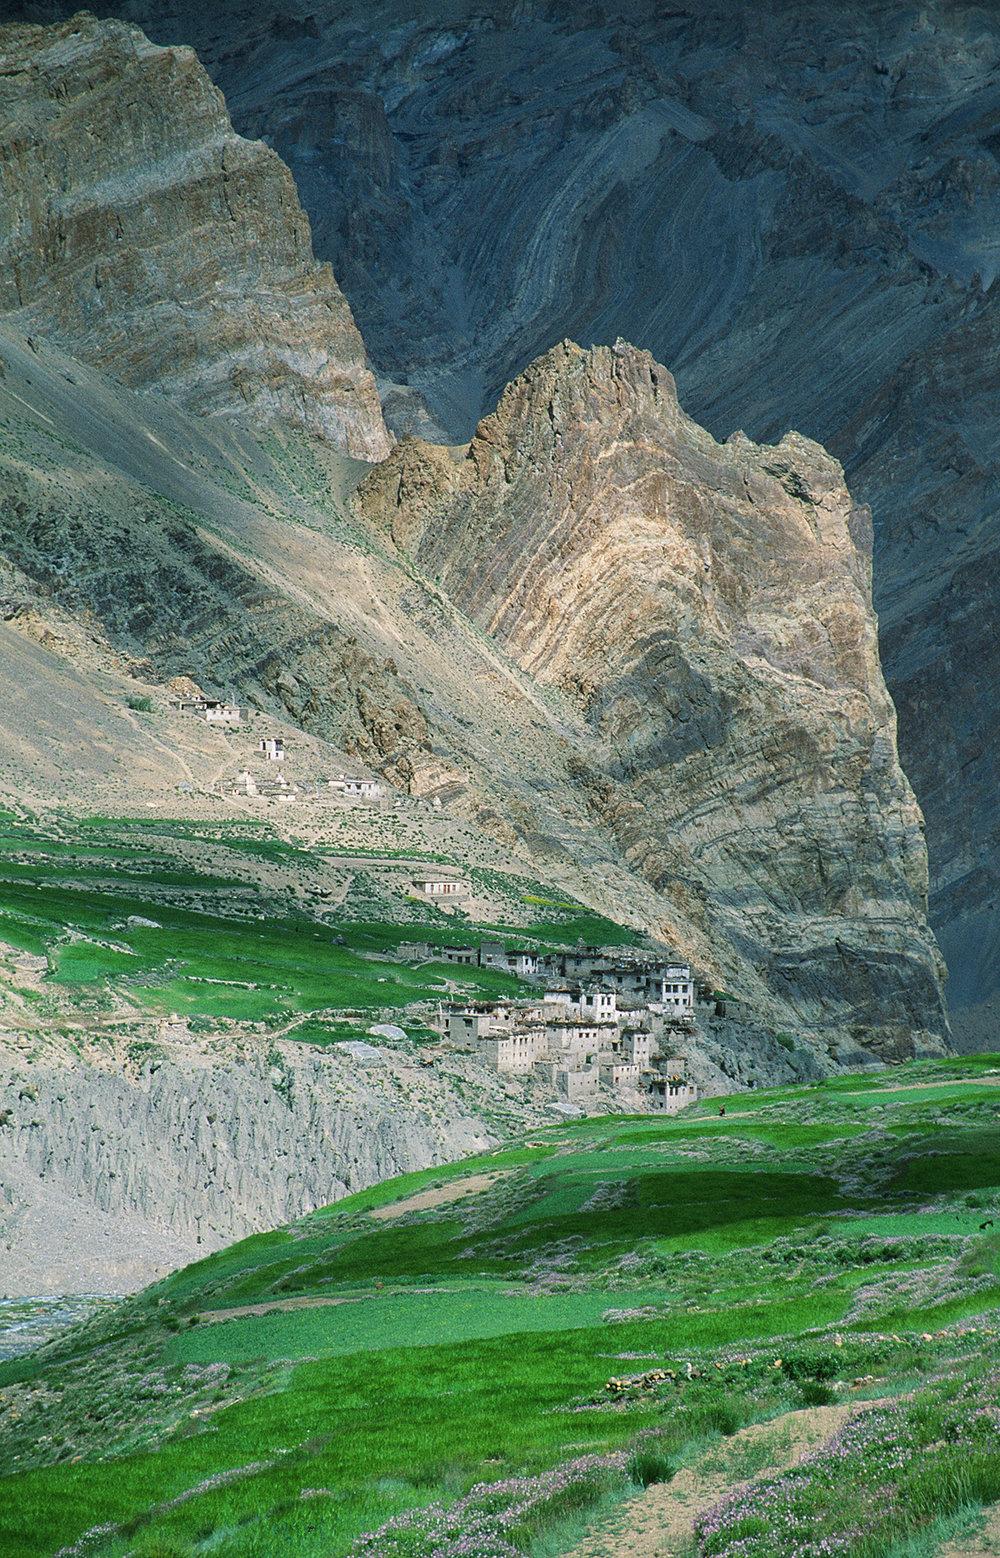 Remote village, Ladakh, India